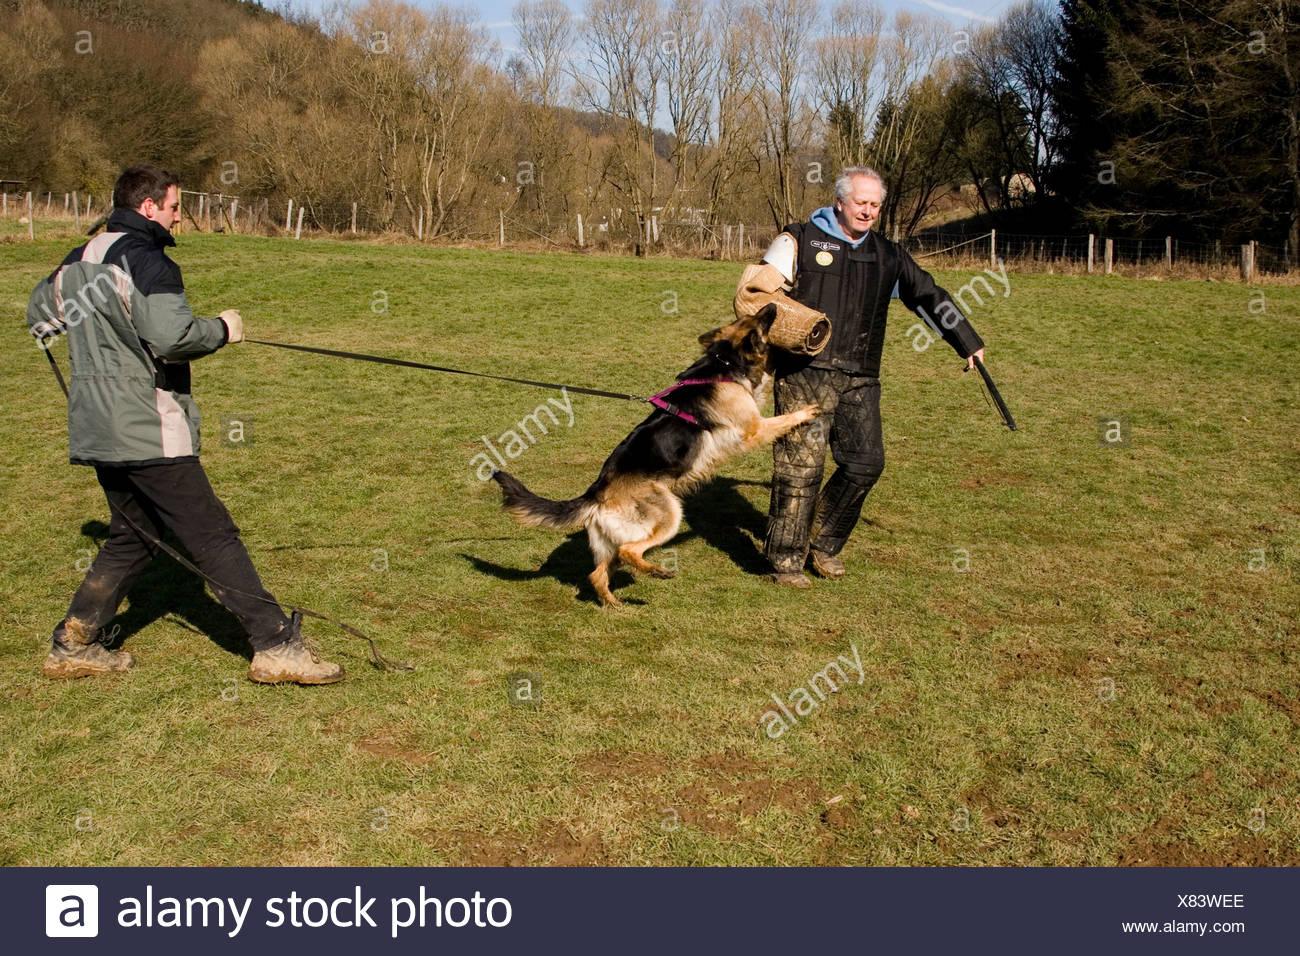 Two men training a German shepherd dog in protective behavior in Daun, Vulkaneifel, Germany, Europe - Stock Image